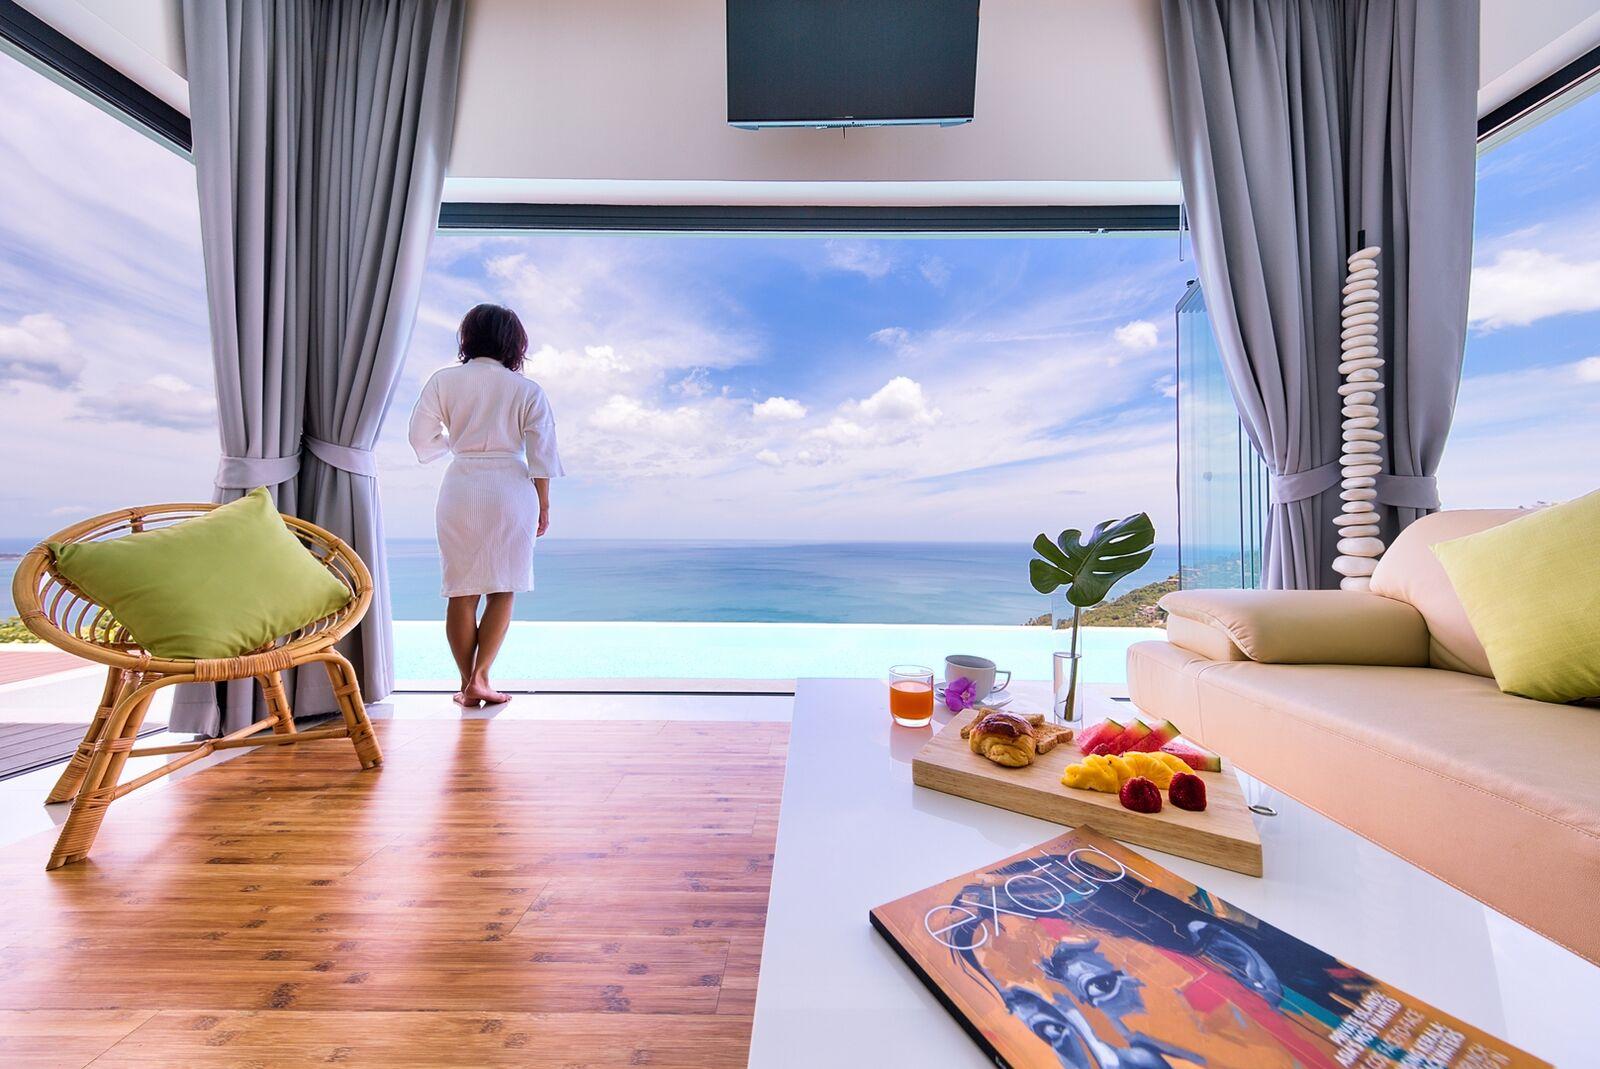 4 Bedroom Sea View Villa with Two Pools at Chaweng Koh Samui